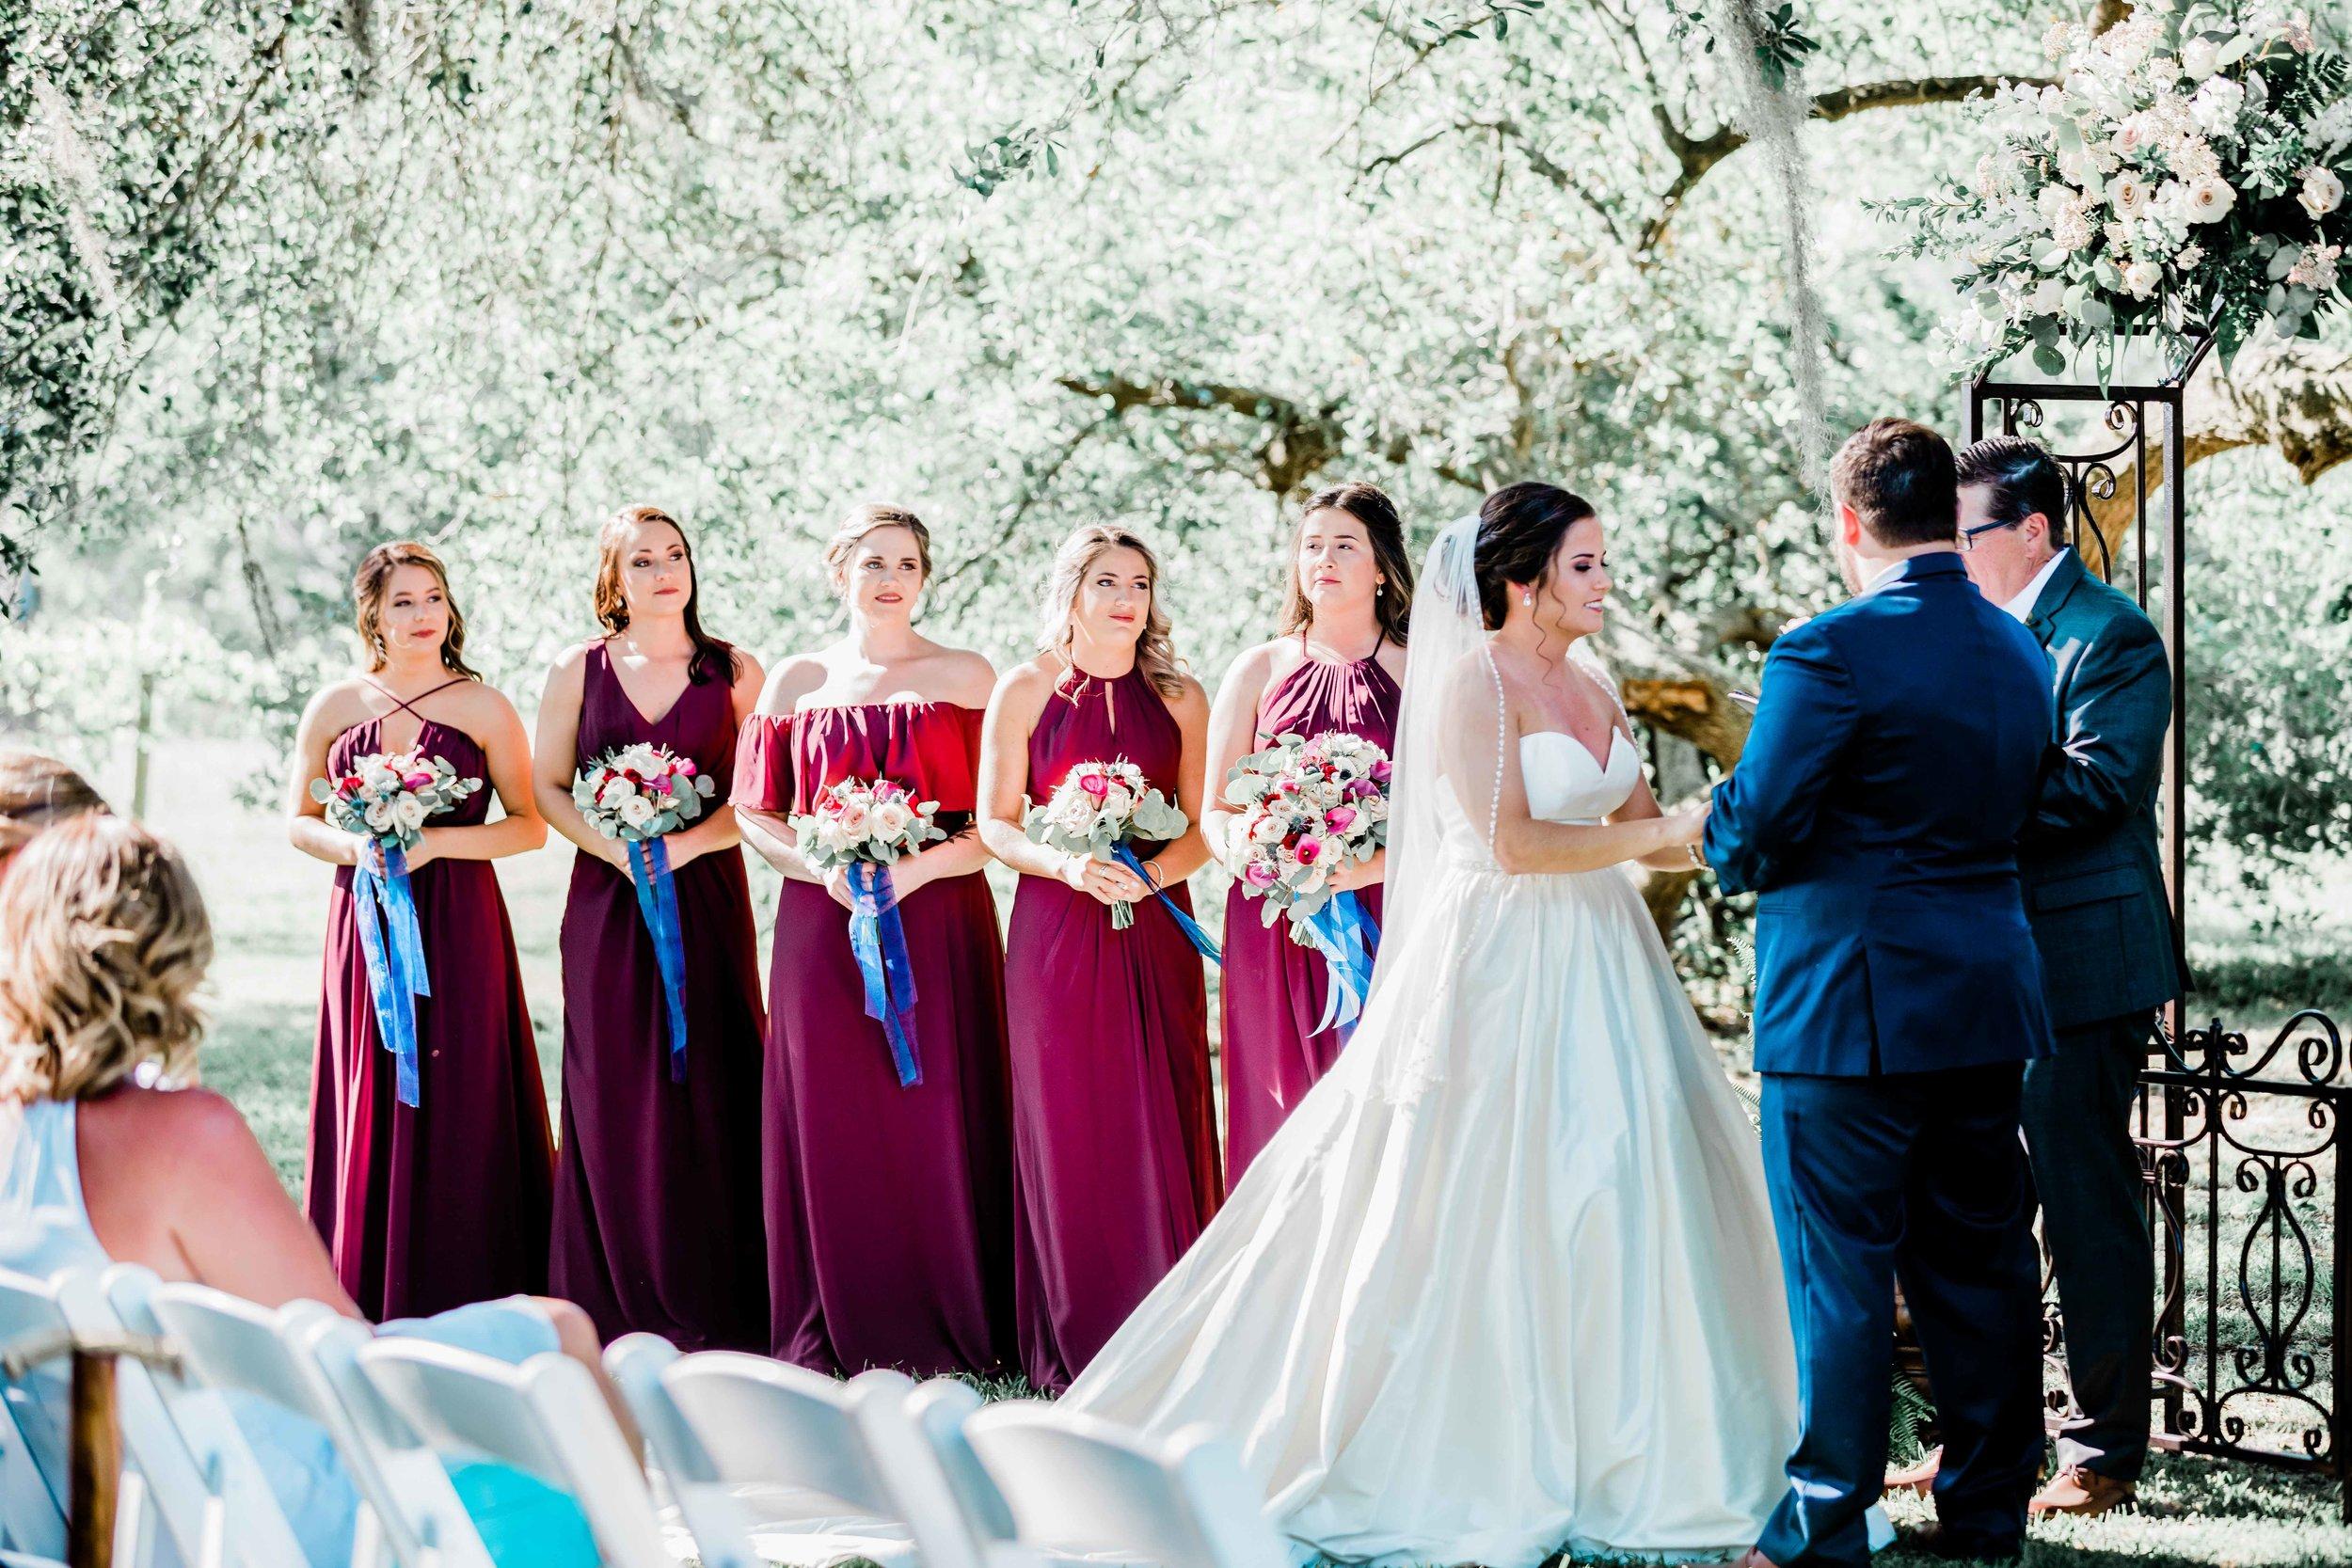 20190427-Southern Lens Photography- Savannah Wedding Photographer-Screven and Caroline-201964.jpg